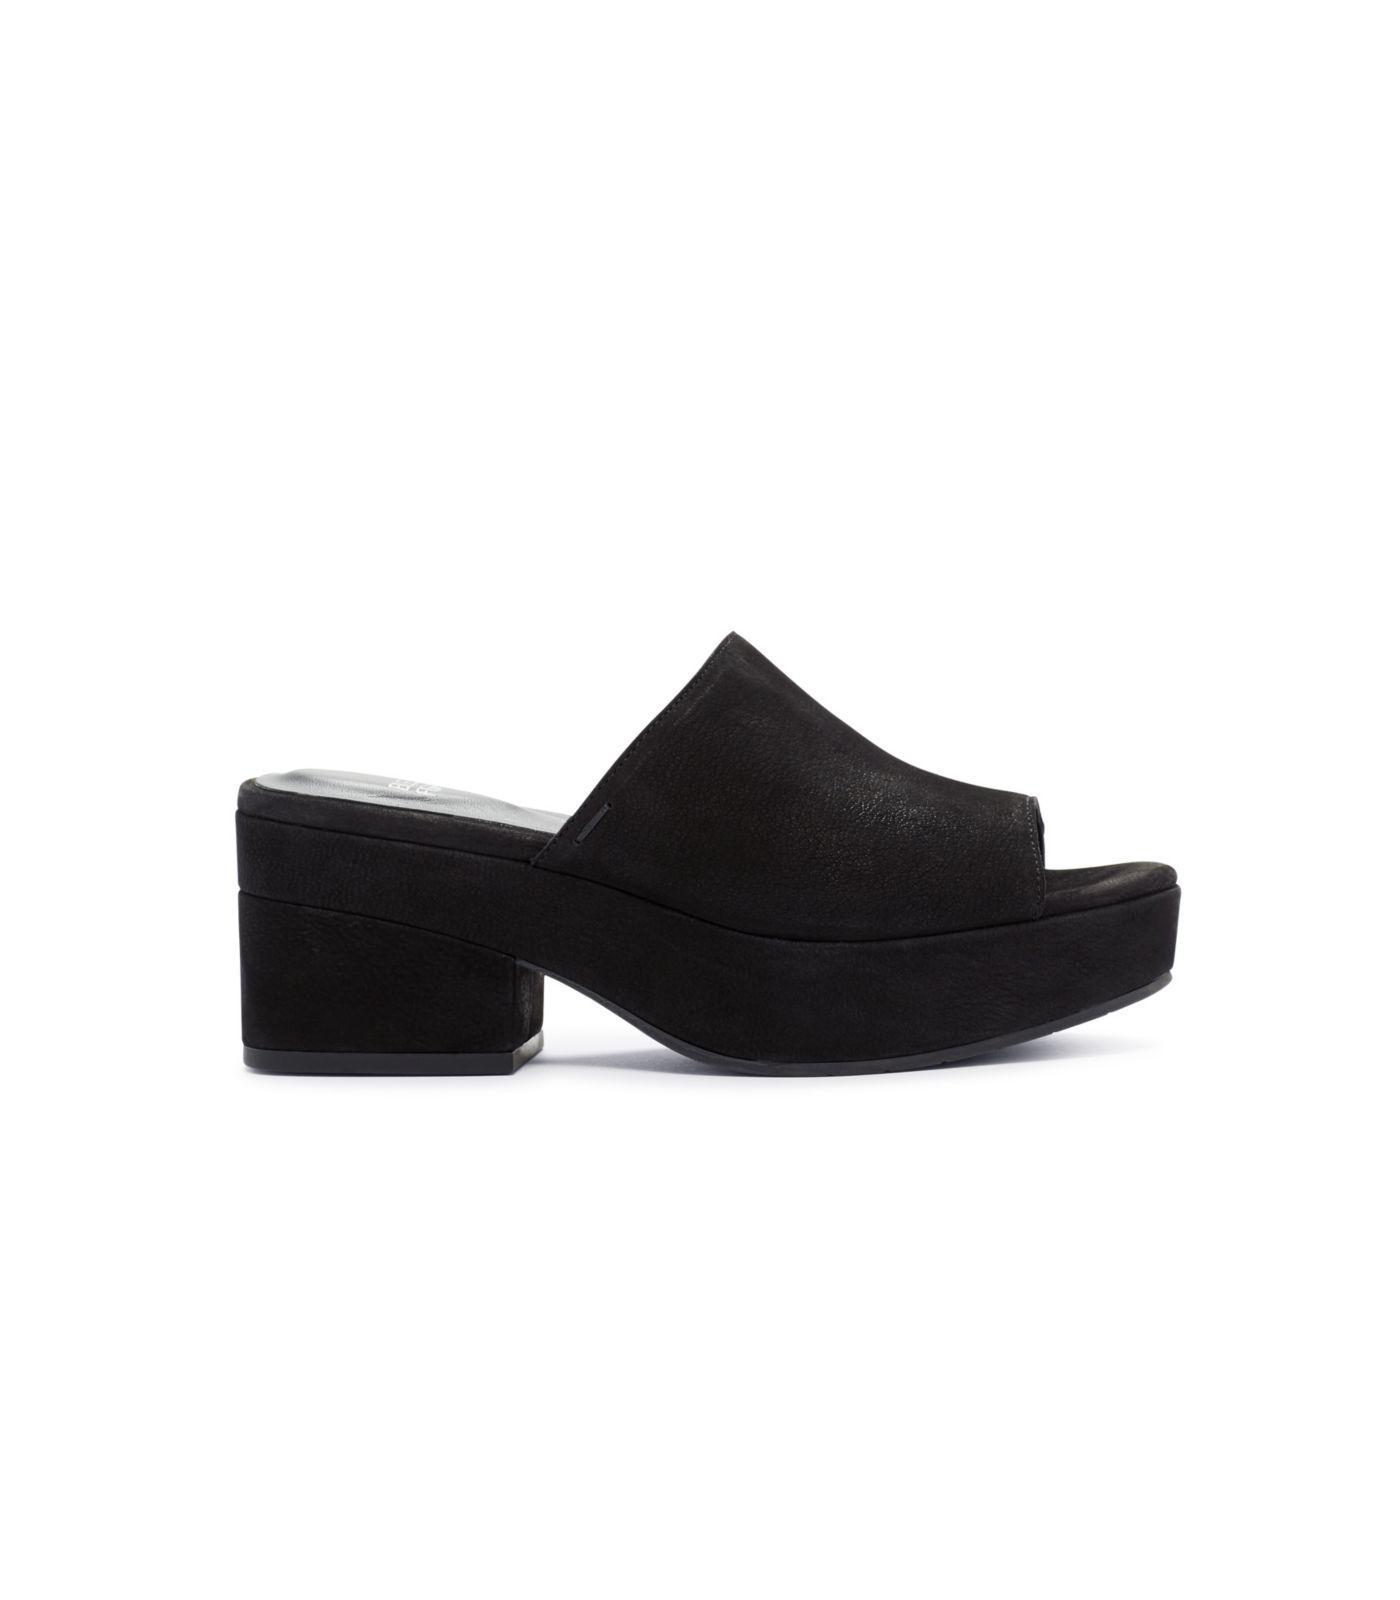 f1ac56aaee8 Lyst - Eileen Fisher Tumbled Nubuck Dana Platform Sandal in Black